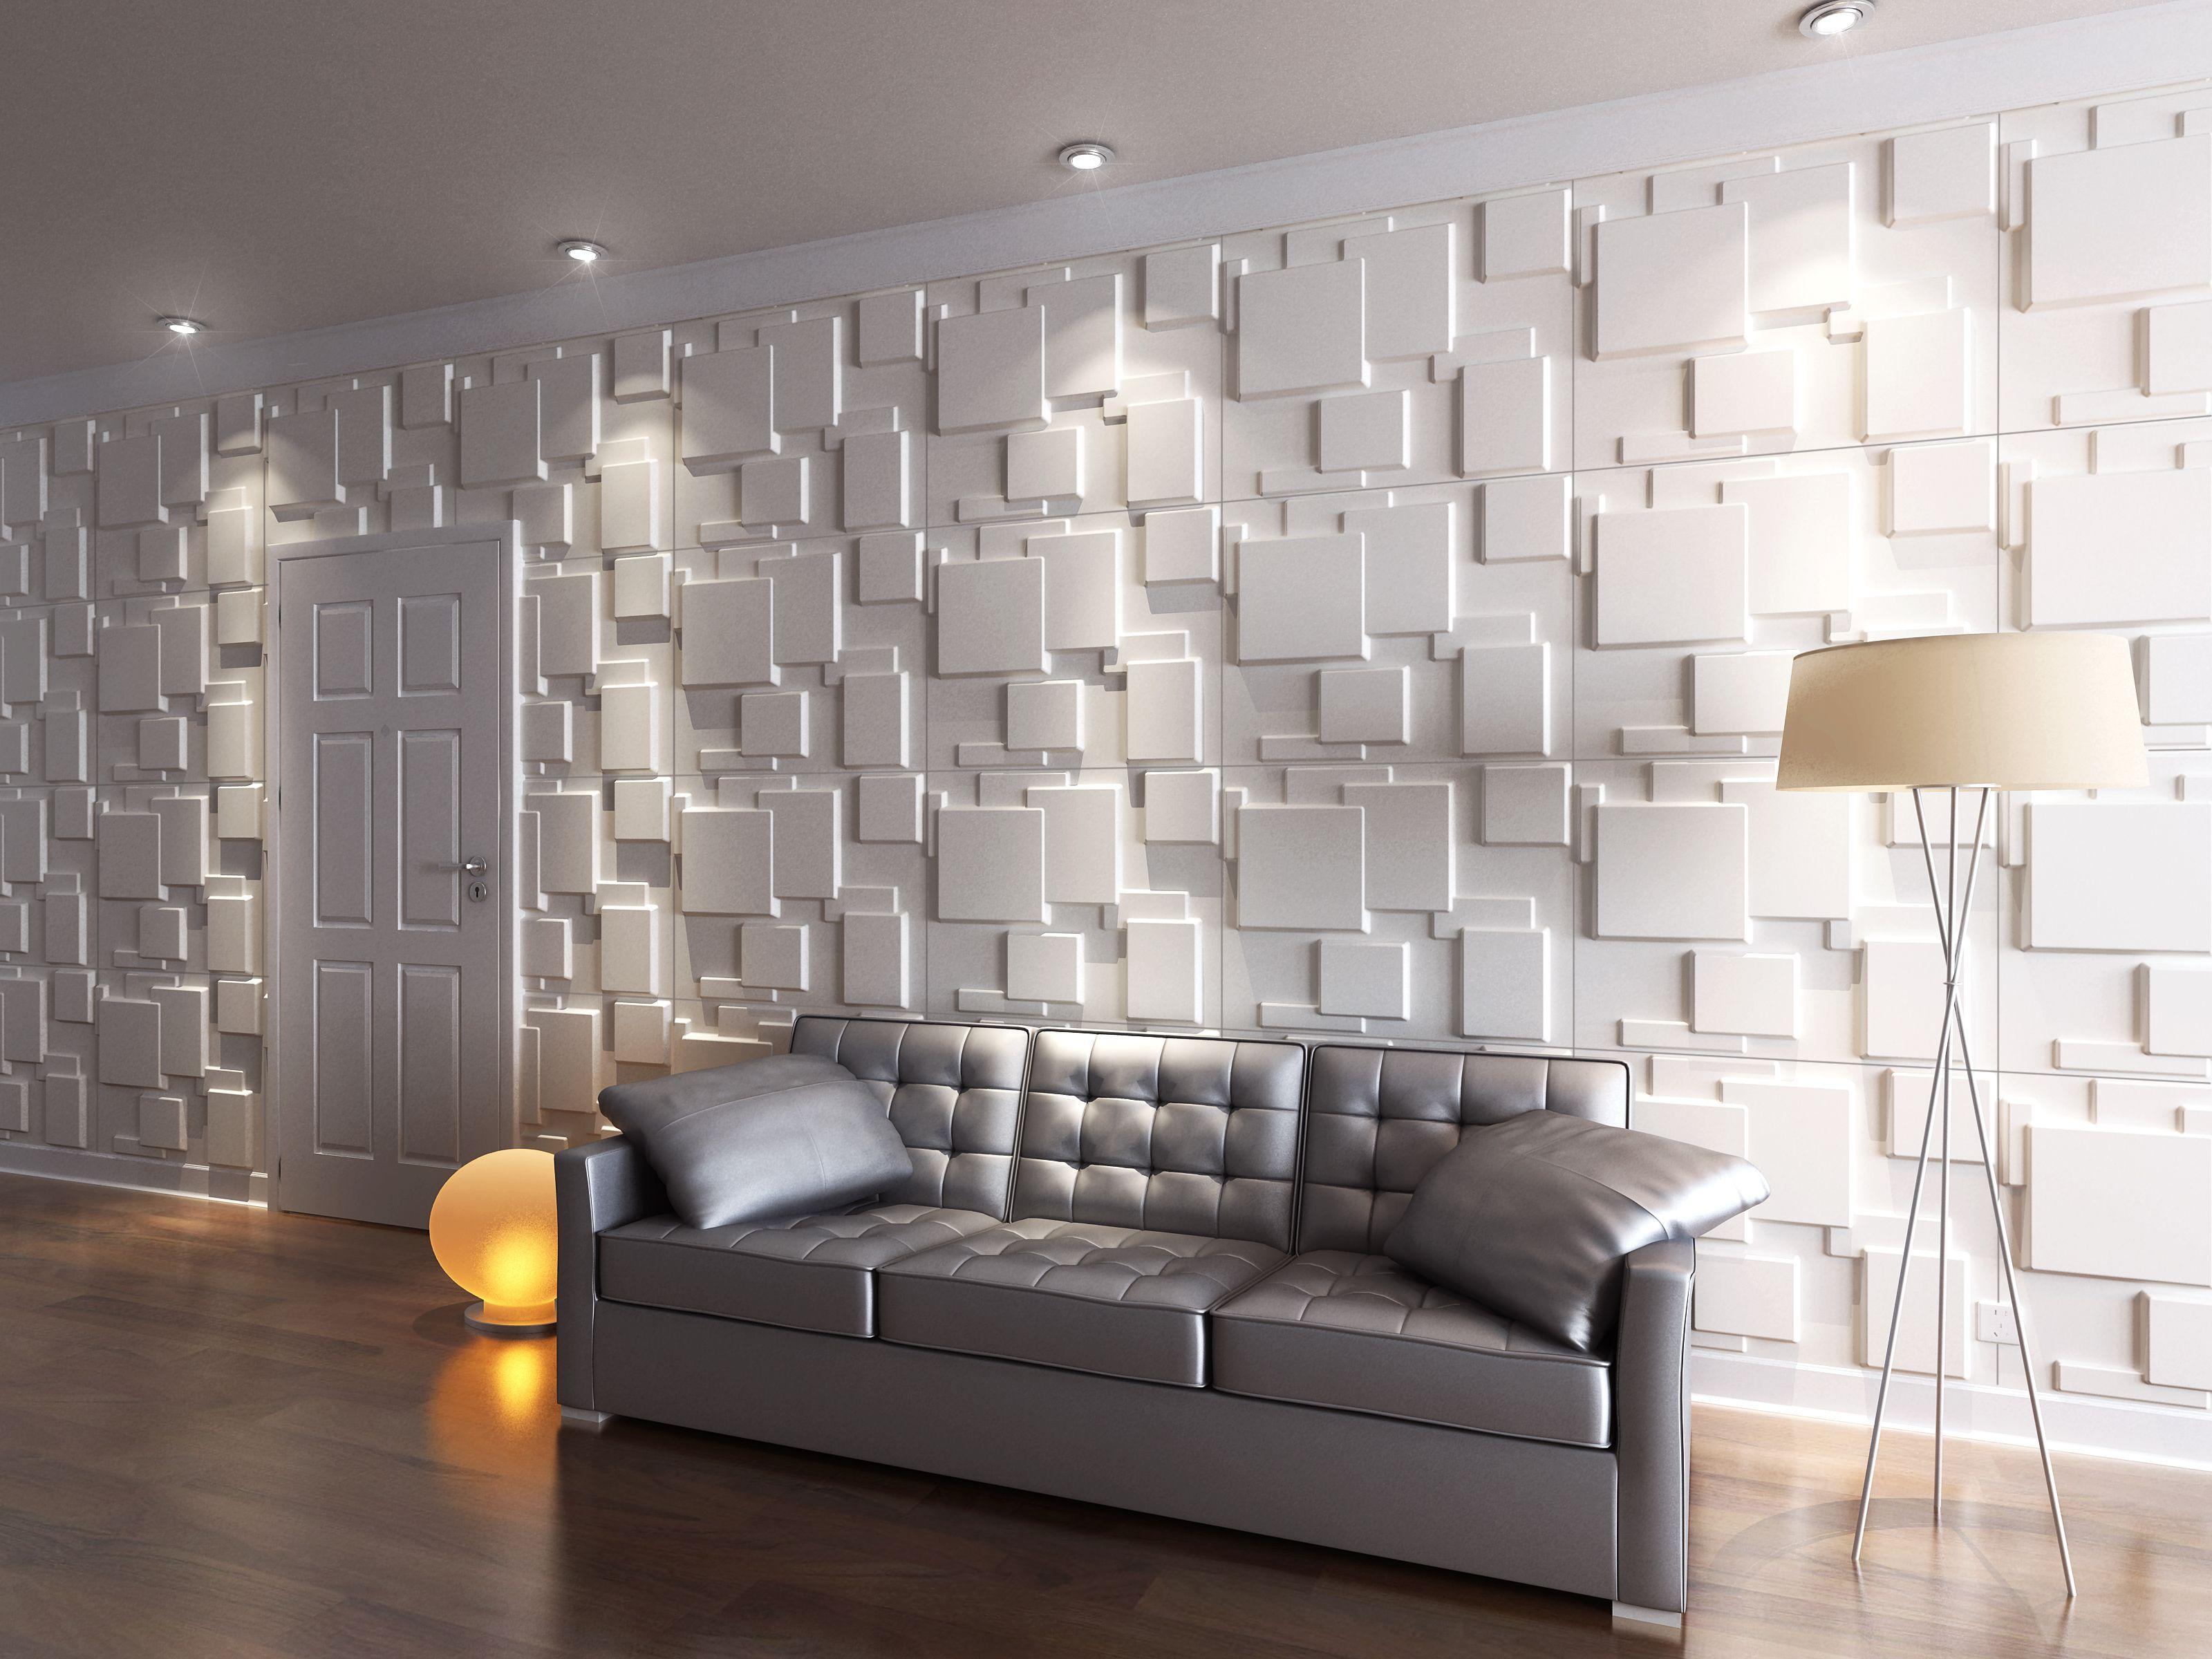 Paneles 3dcora Deckenverkleidung Wandpaneele Wandverkleidung